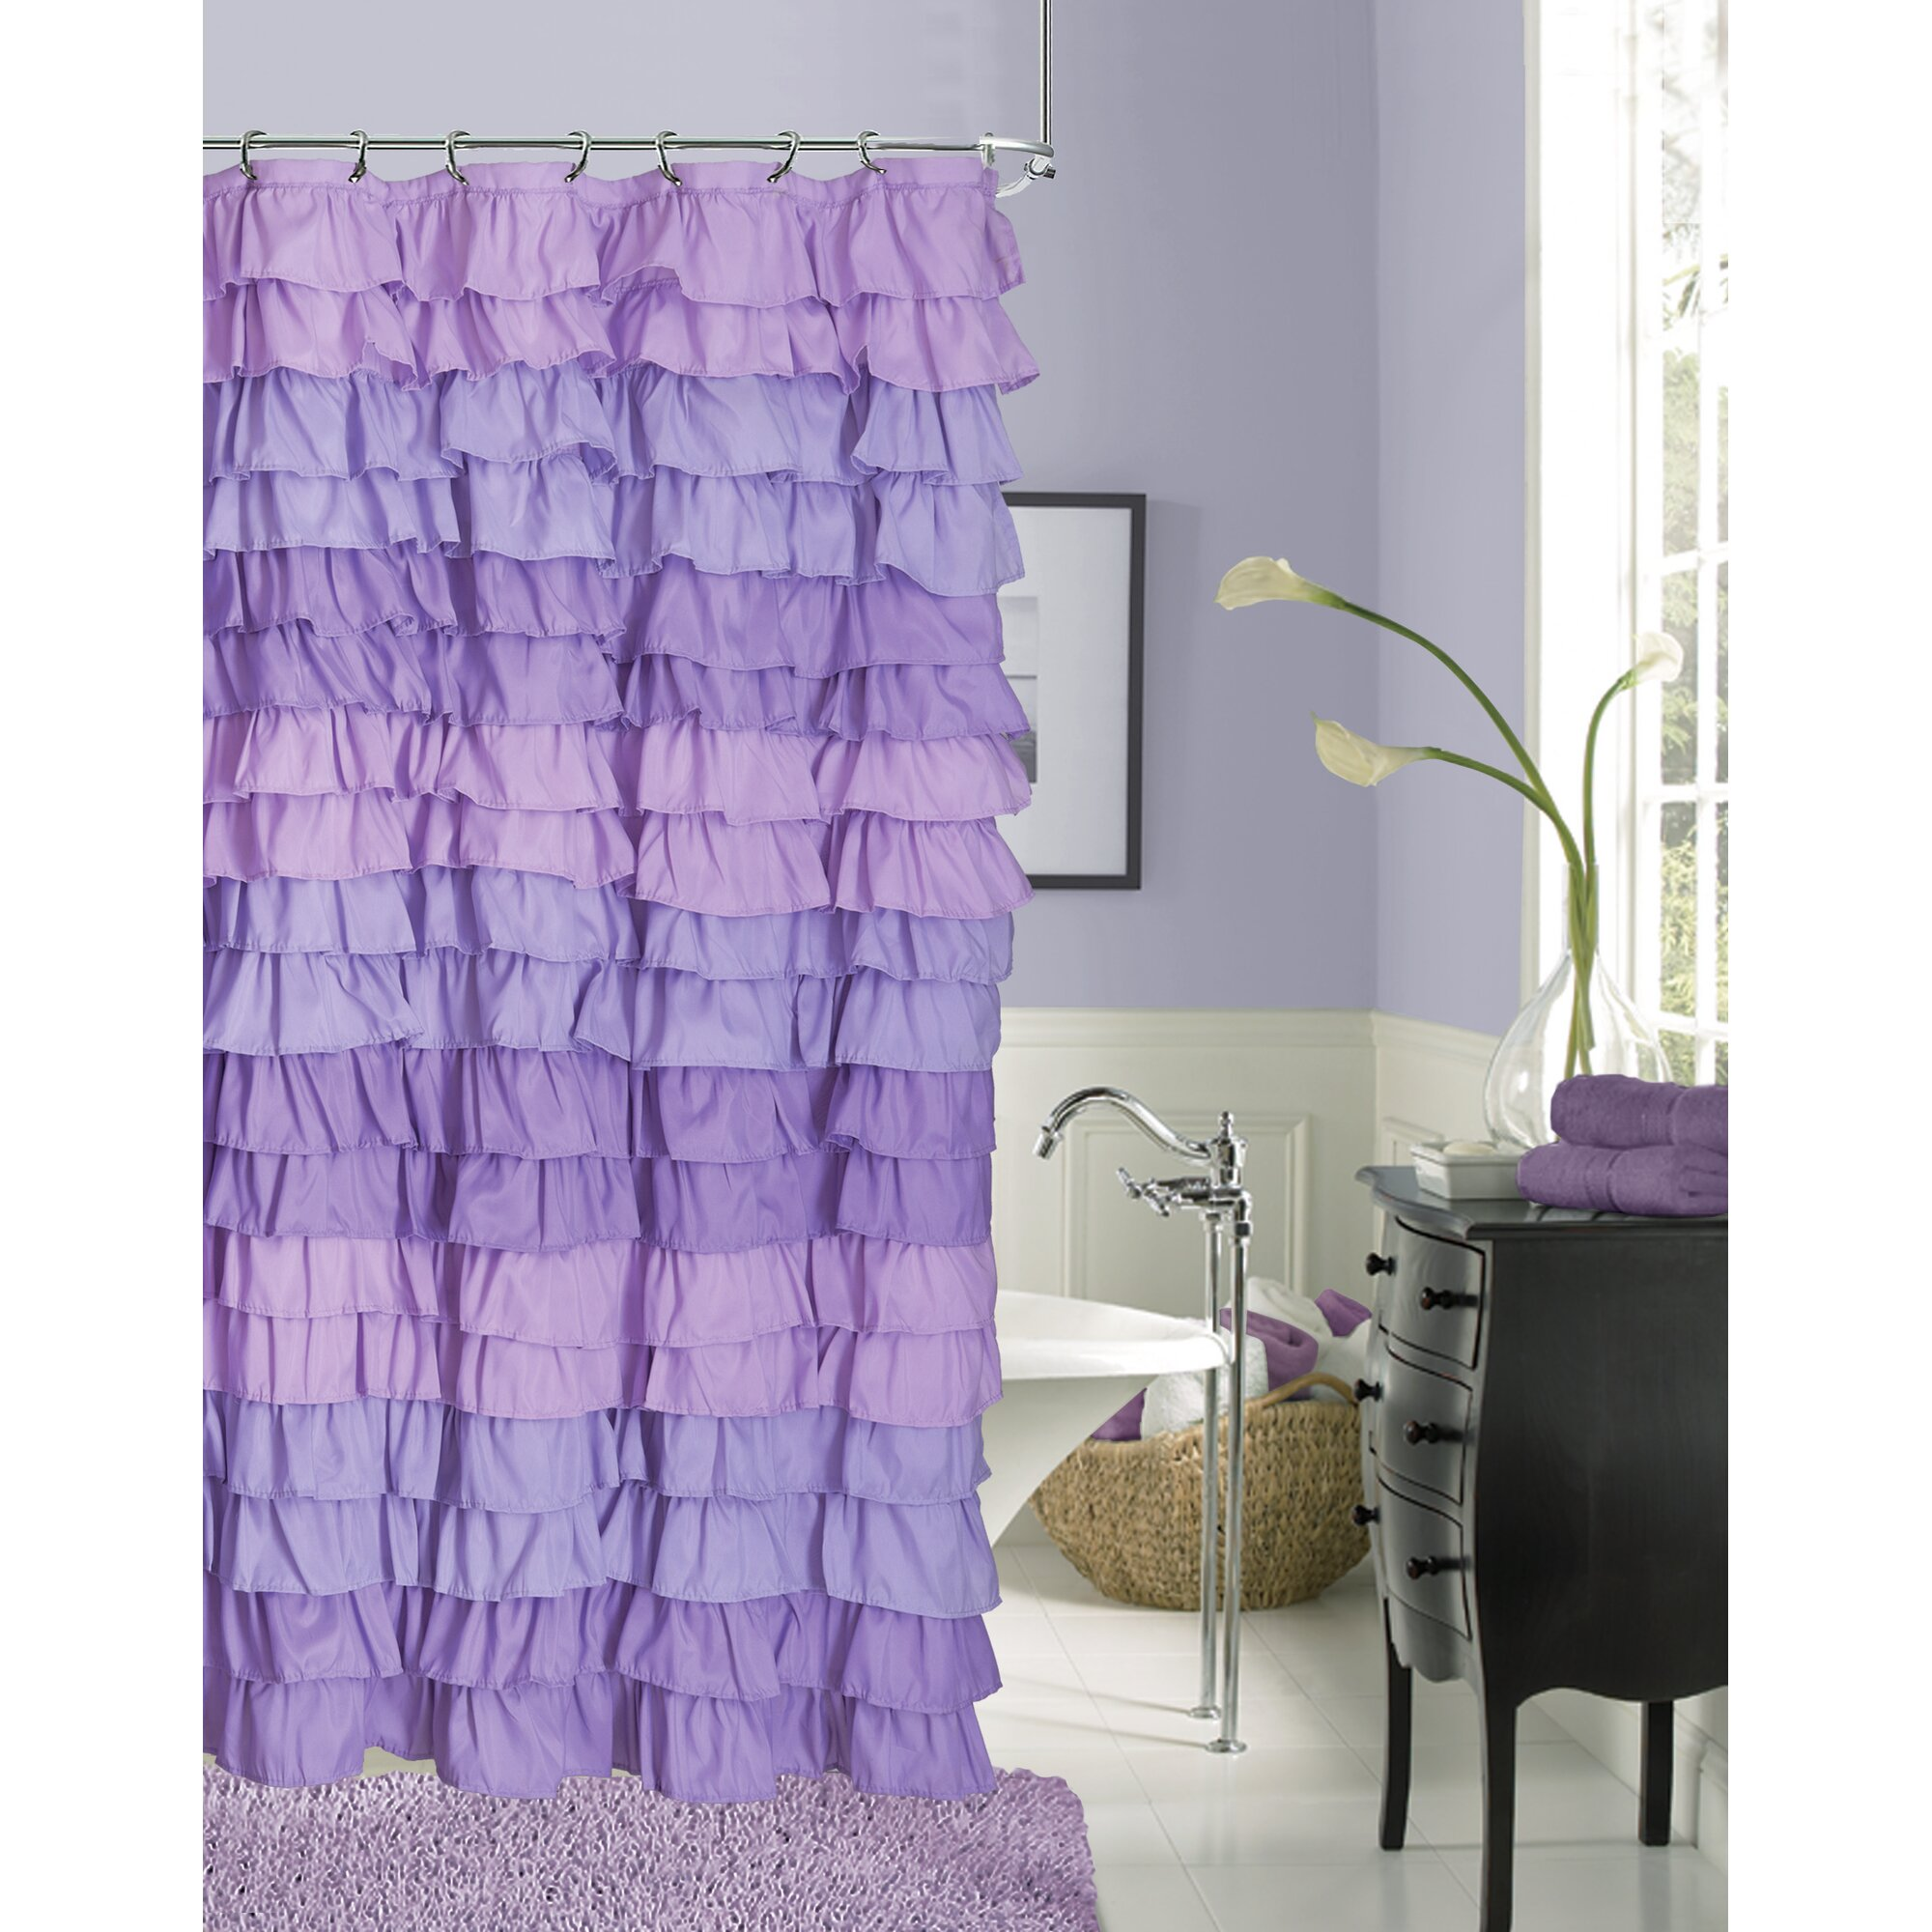 Light pink ruffle shower curtain - Dainty Home Venezia Ruffle Shower Curtain U0026 Reviews Wayfair